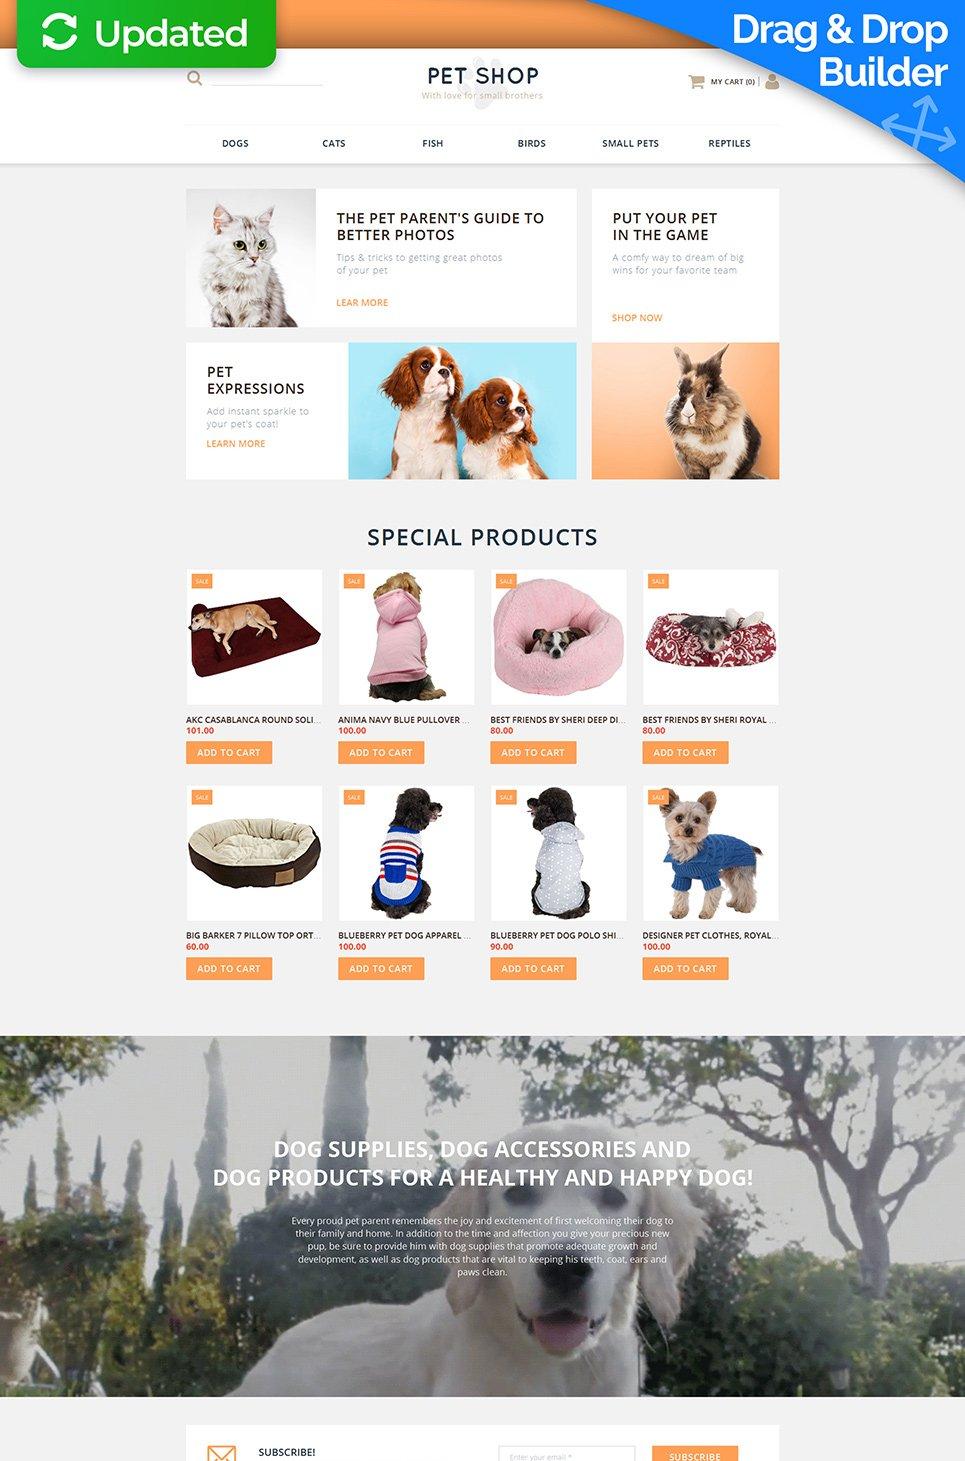 Pet Shop Ecommerce Website Template - image